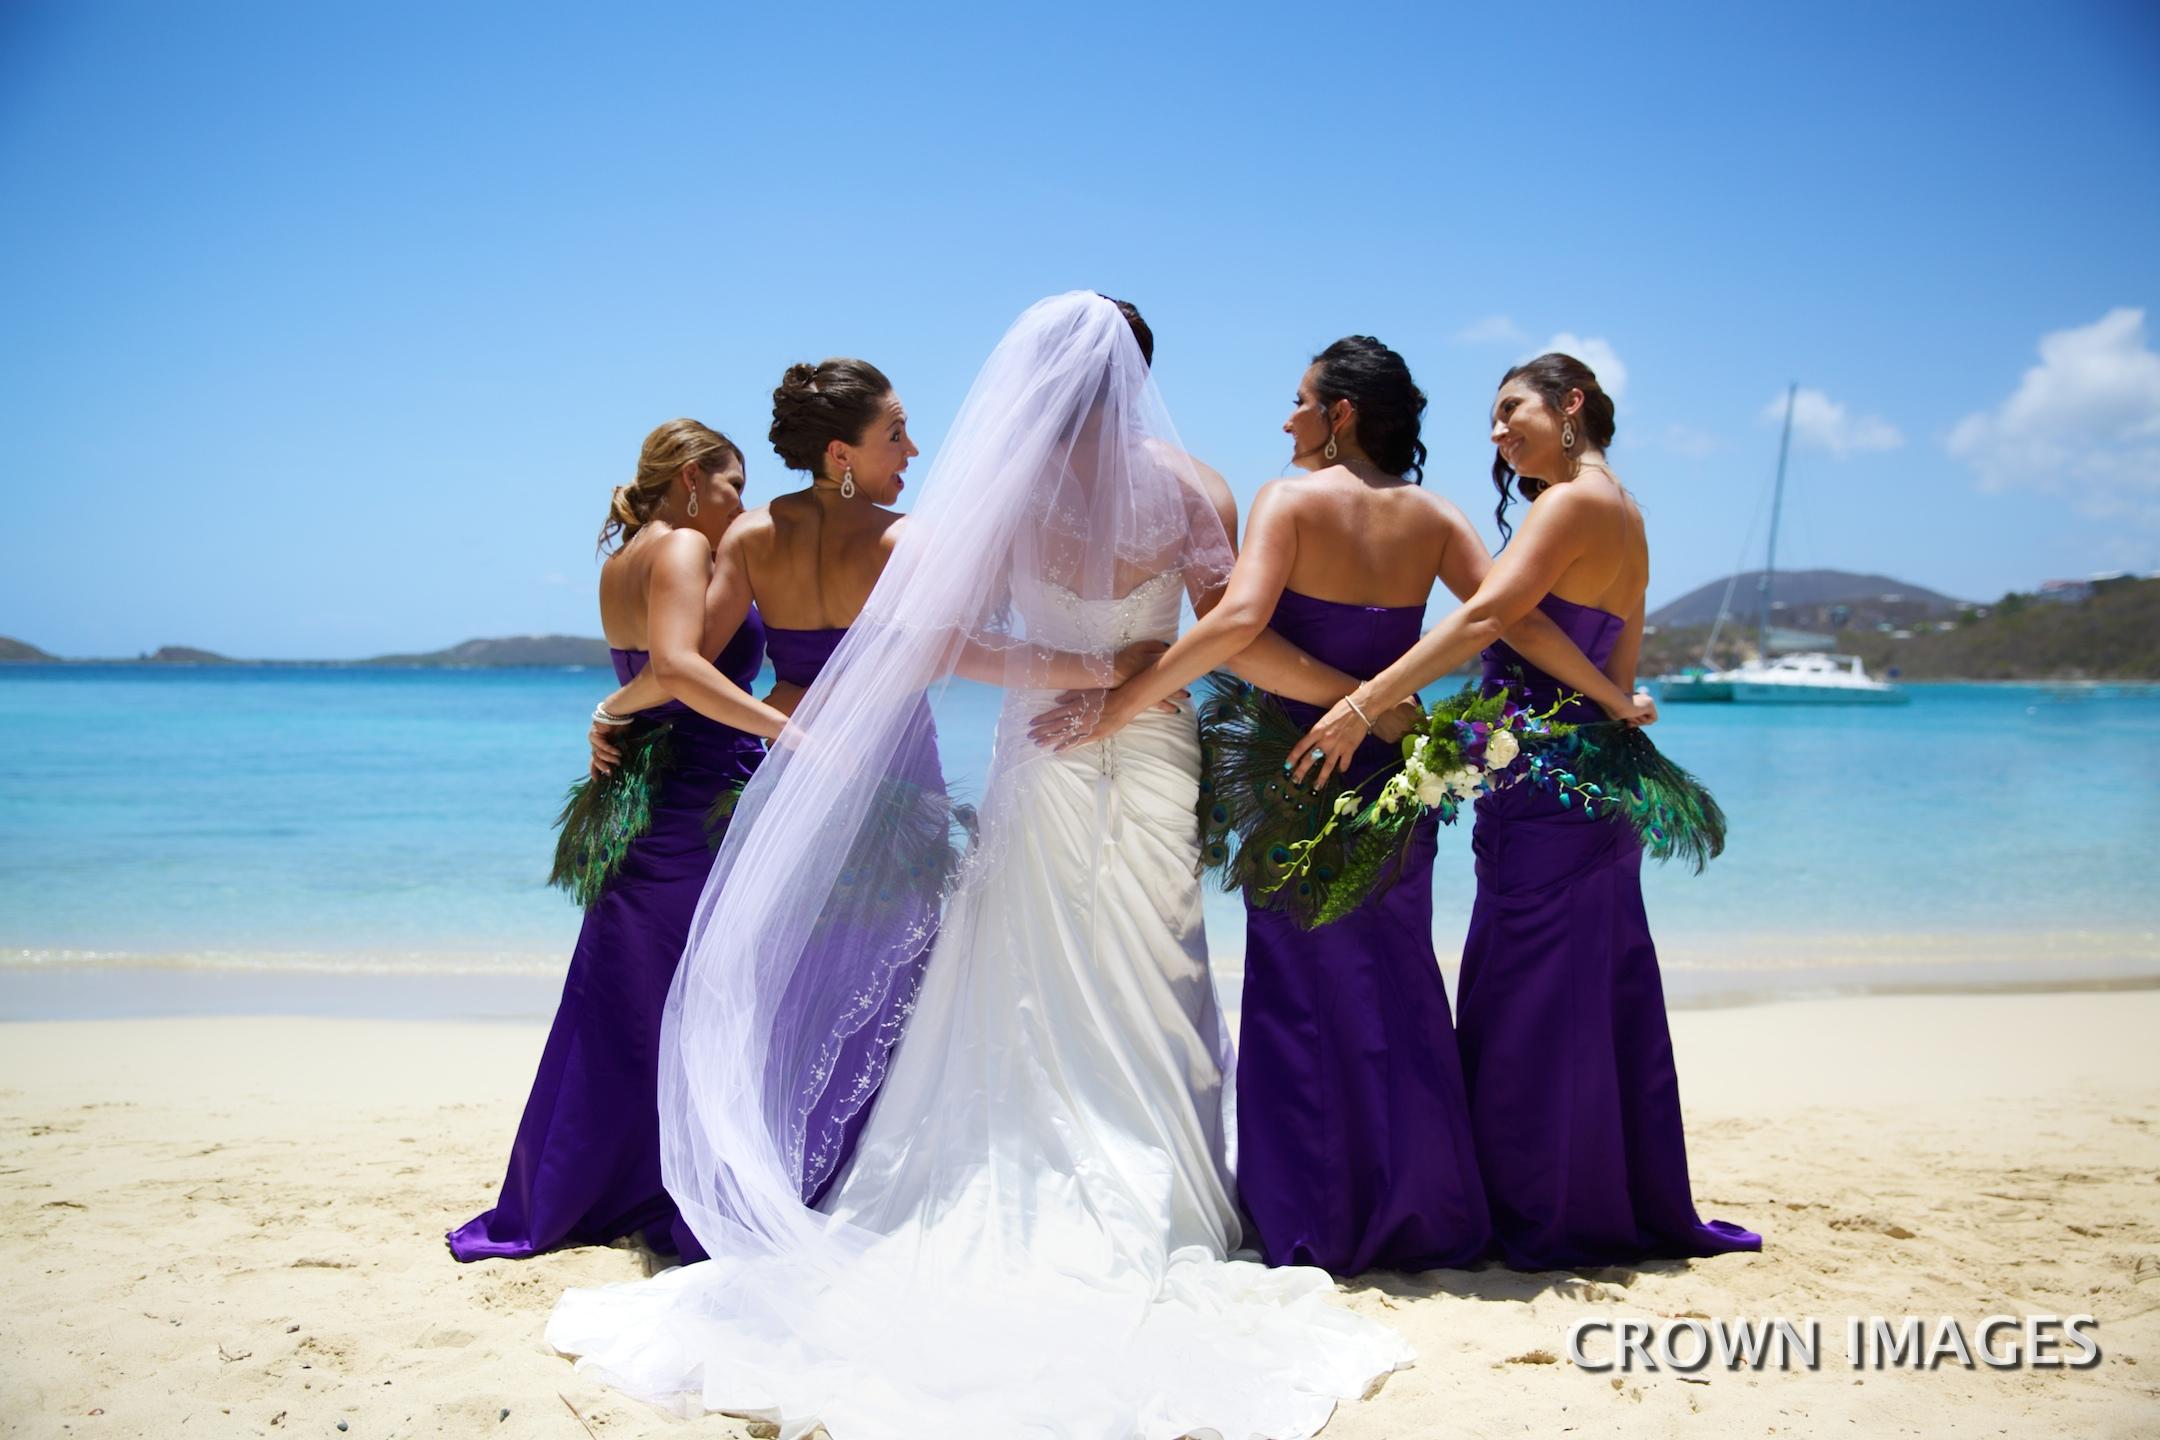 crown images st thomas wedding